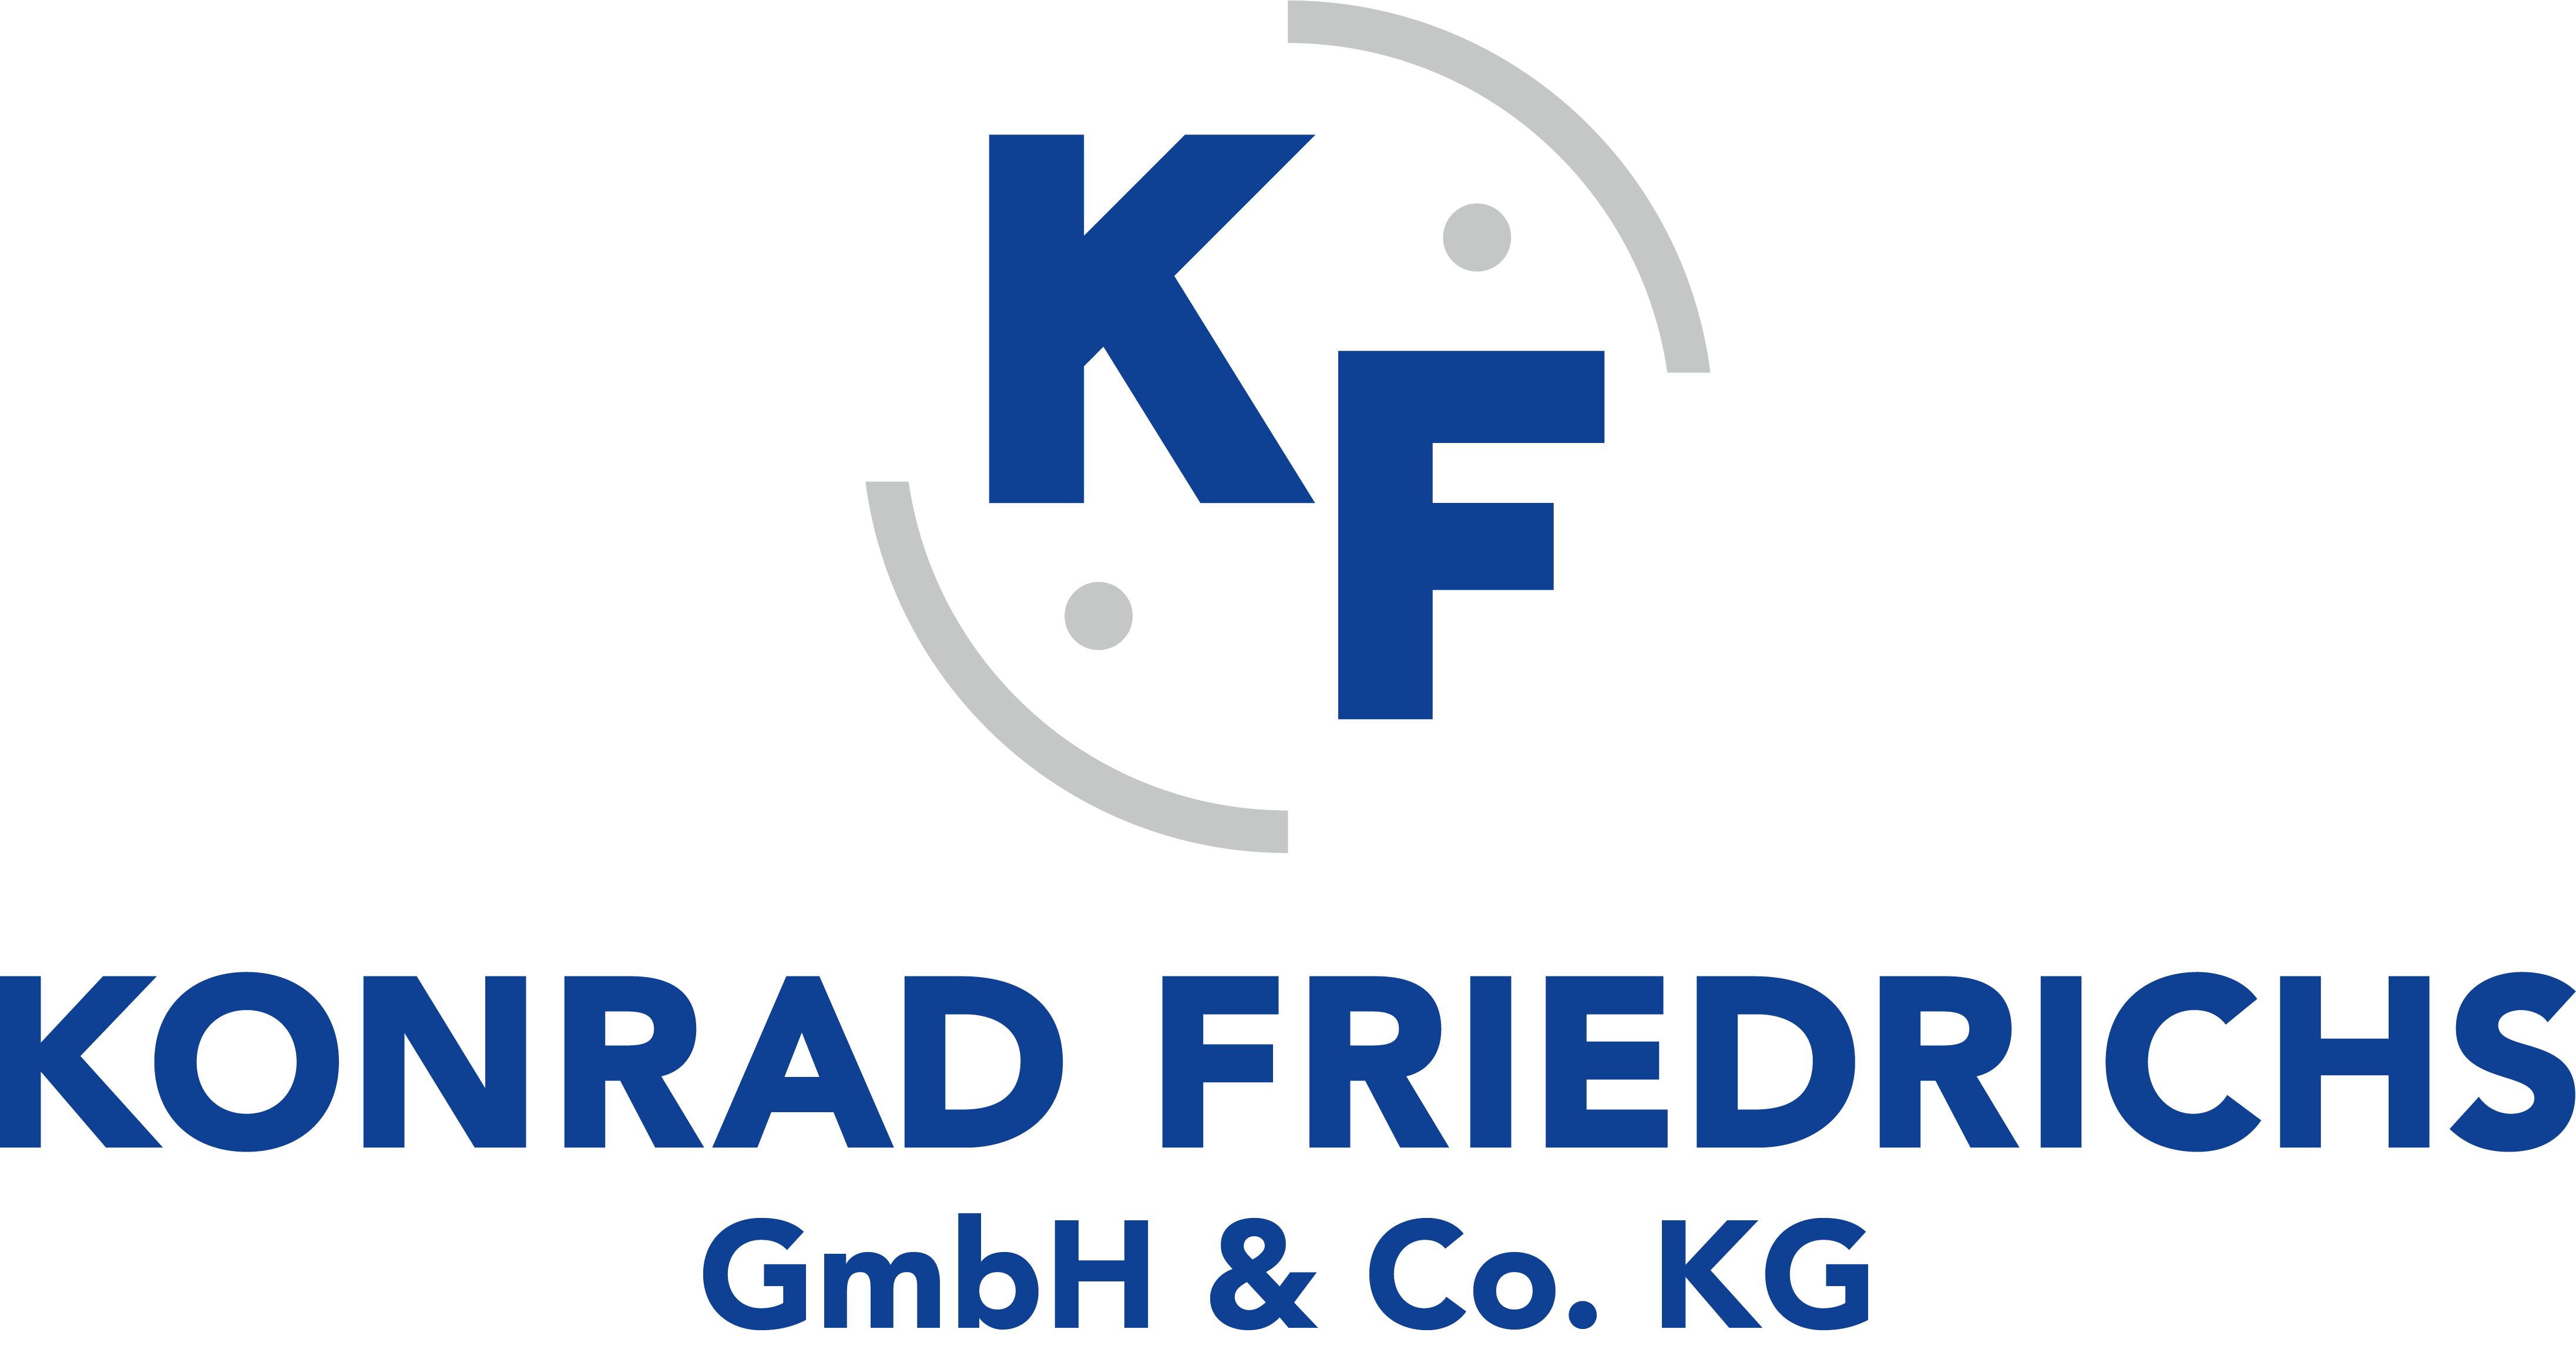 Konrad Friedrichs GmbH & Co. KG